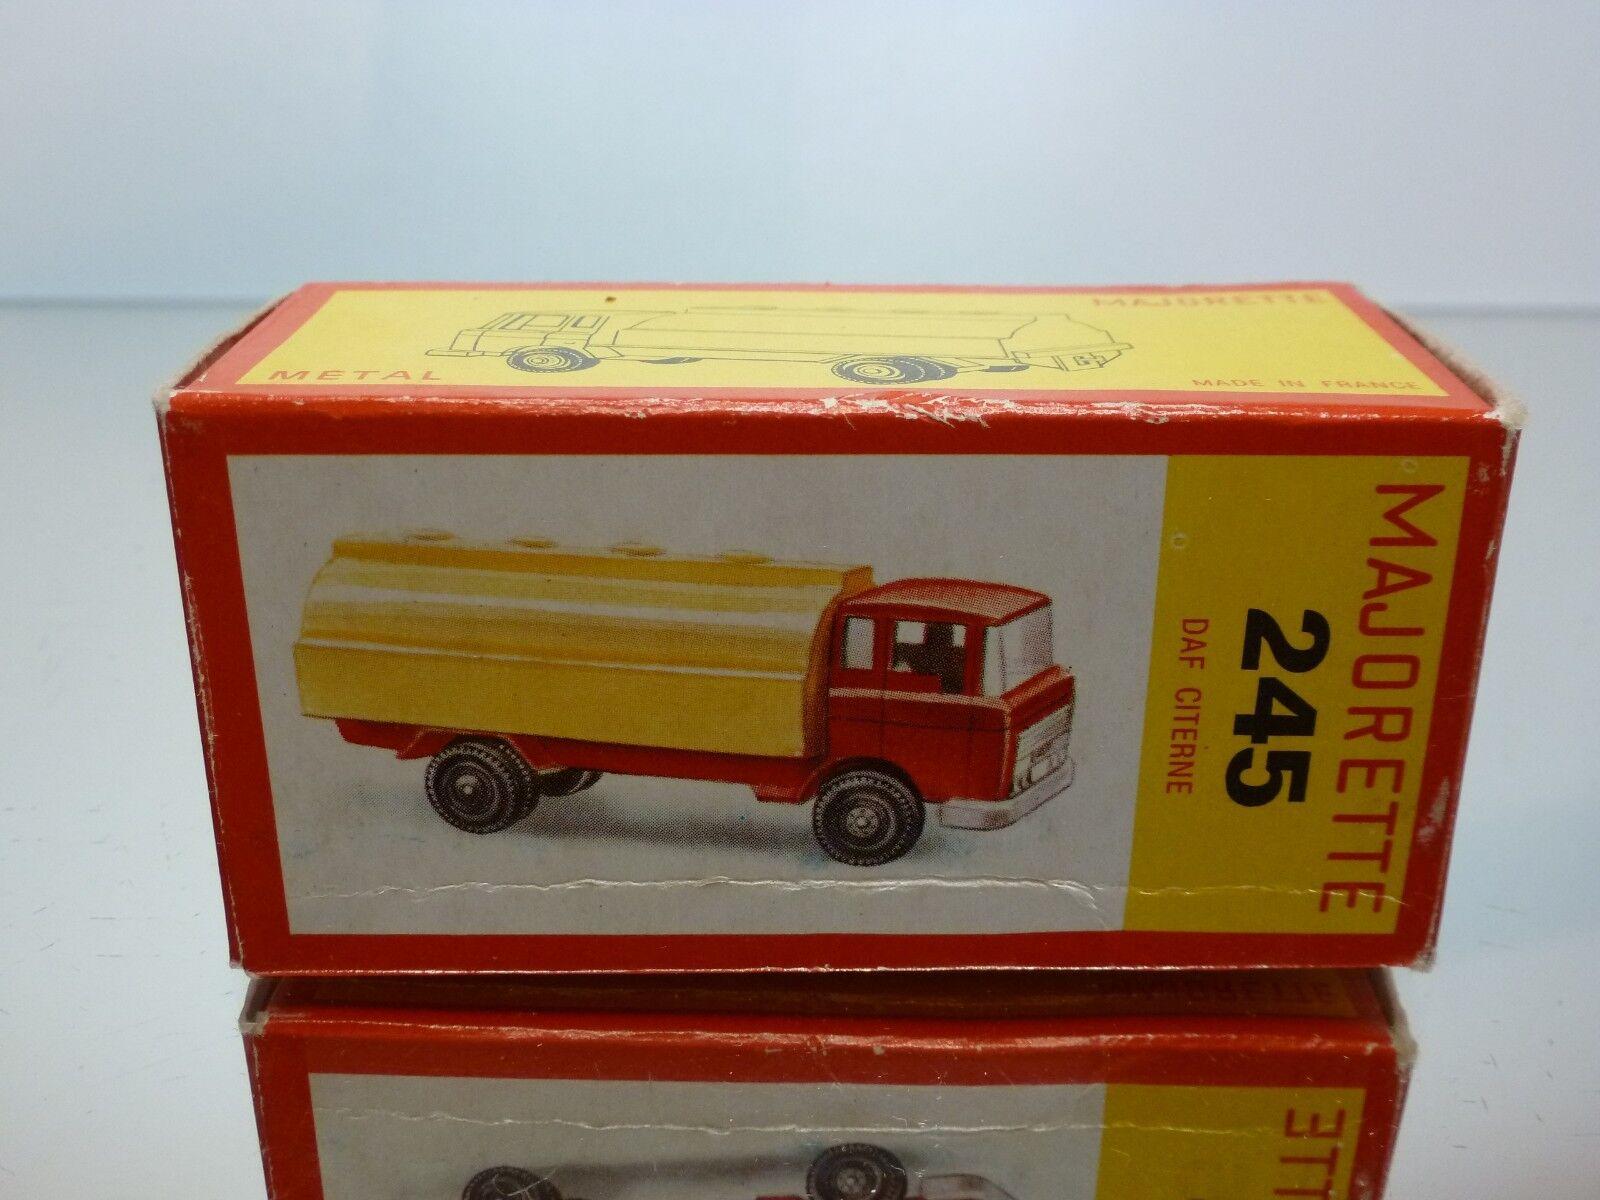 MAJORETTE 245 BOX for DAF 2600 TANKER TRUCK - CITERNE 1 100 - ONLY BOX